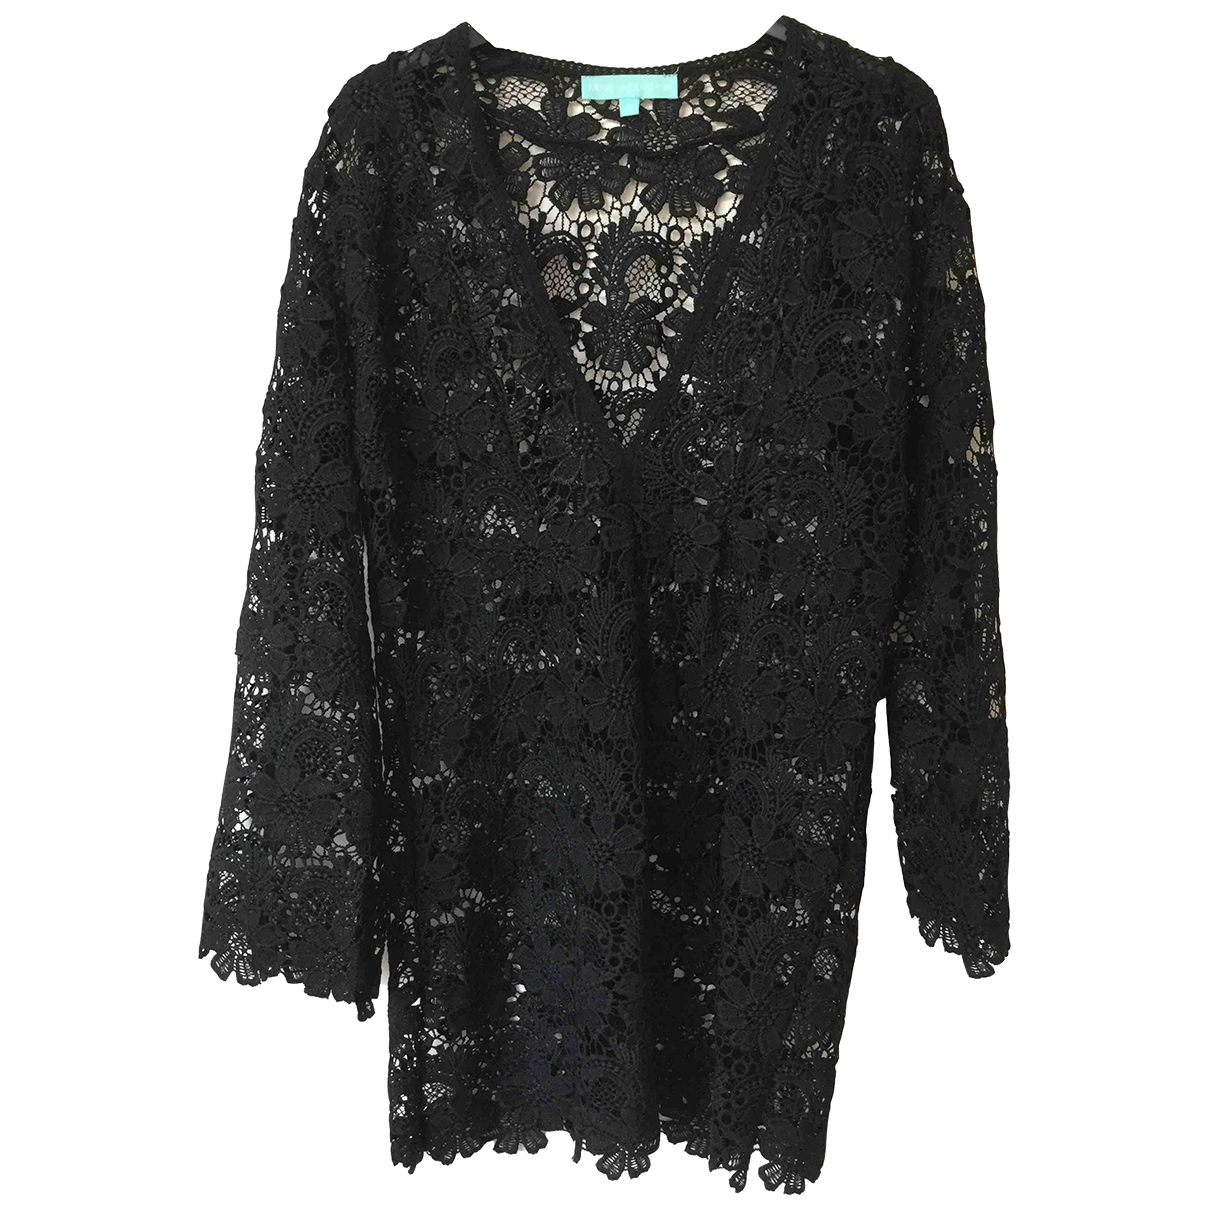 Melissa Odabash \N Black Cotton dress for Women S International